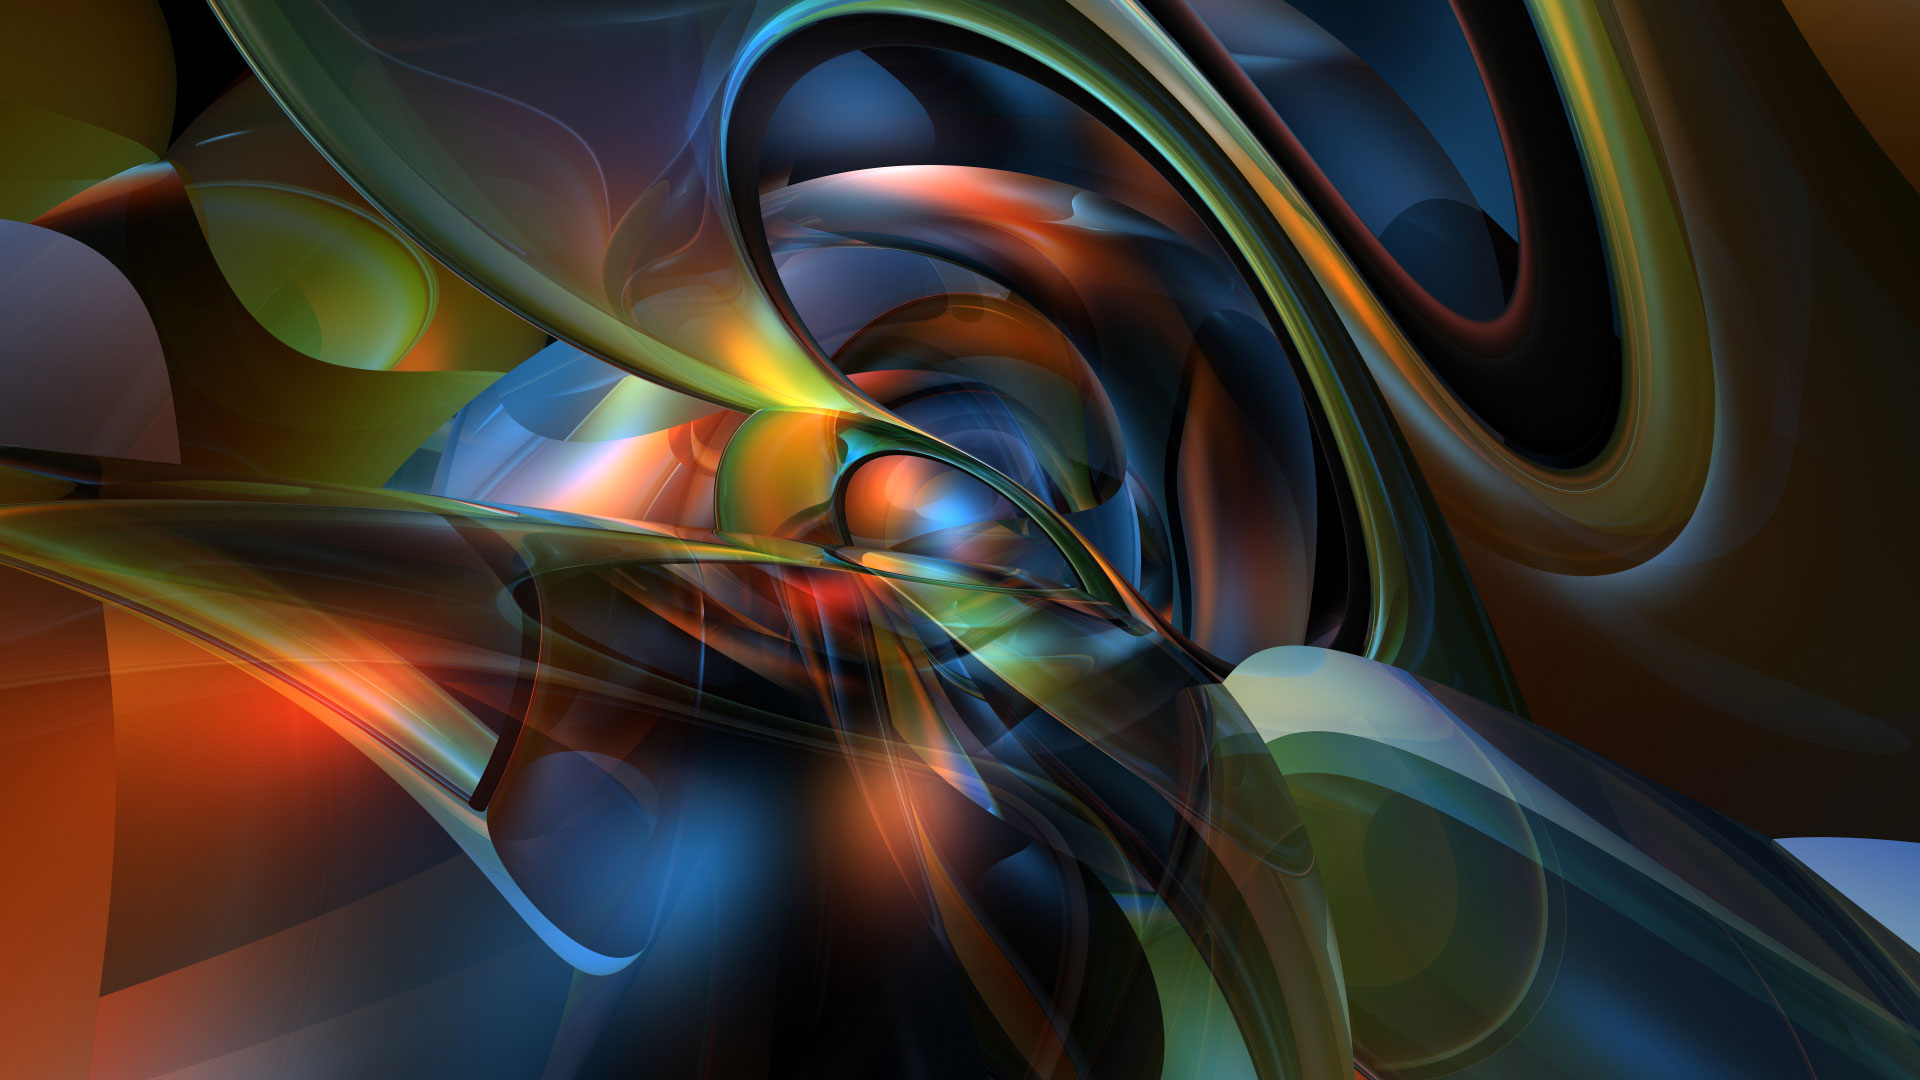 Wallpaper Abstract Designs